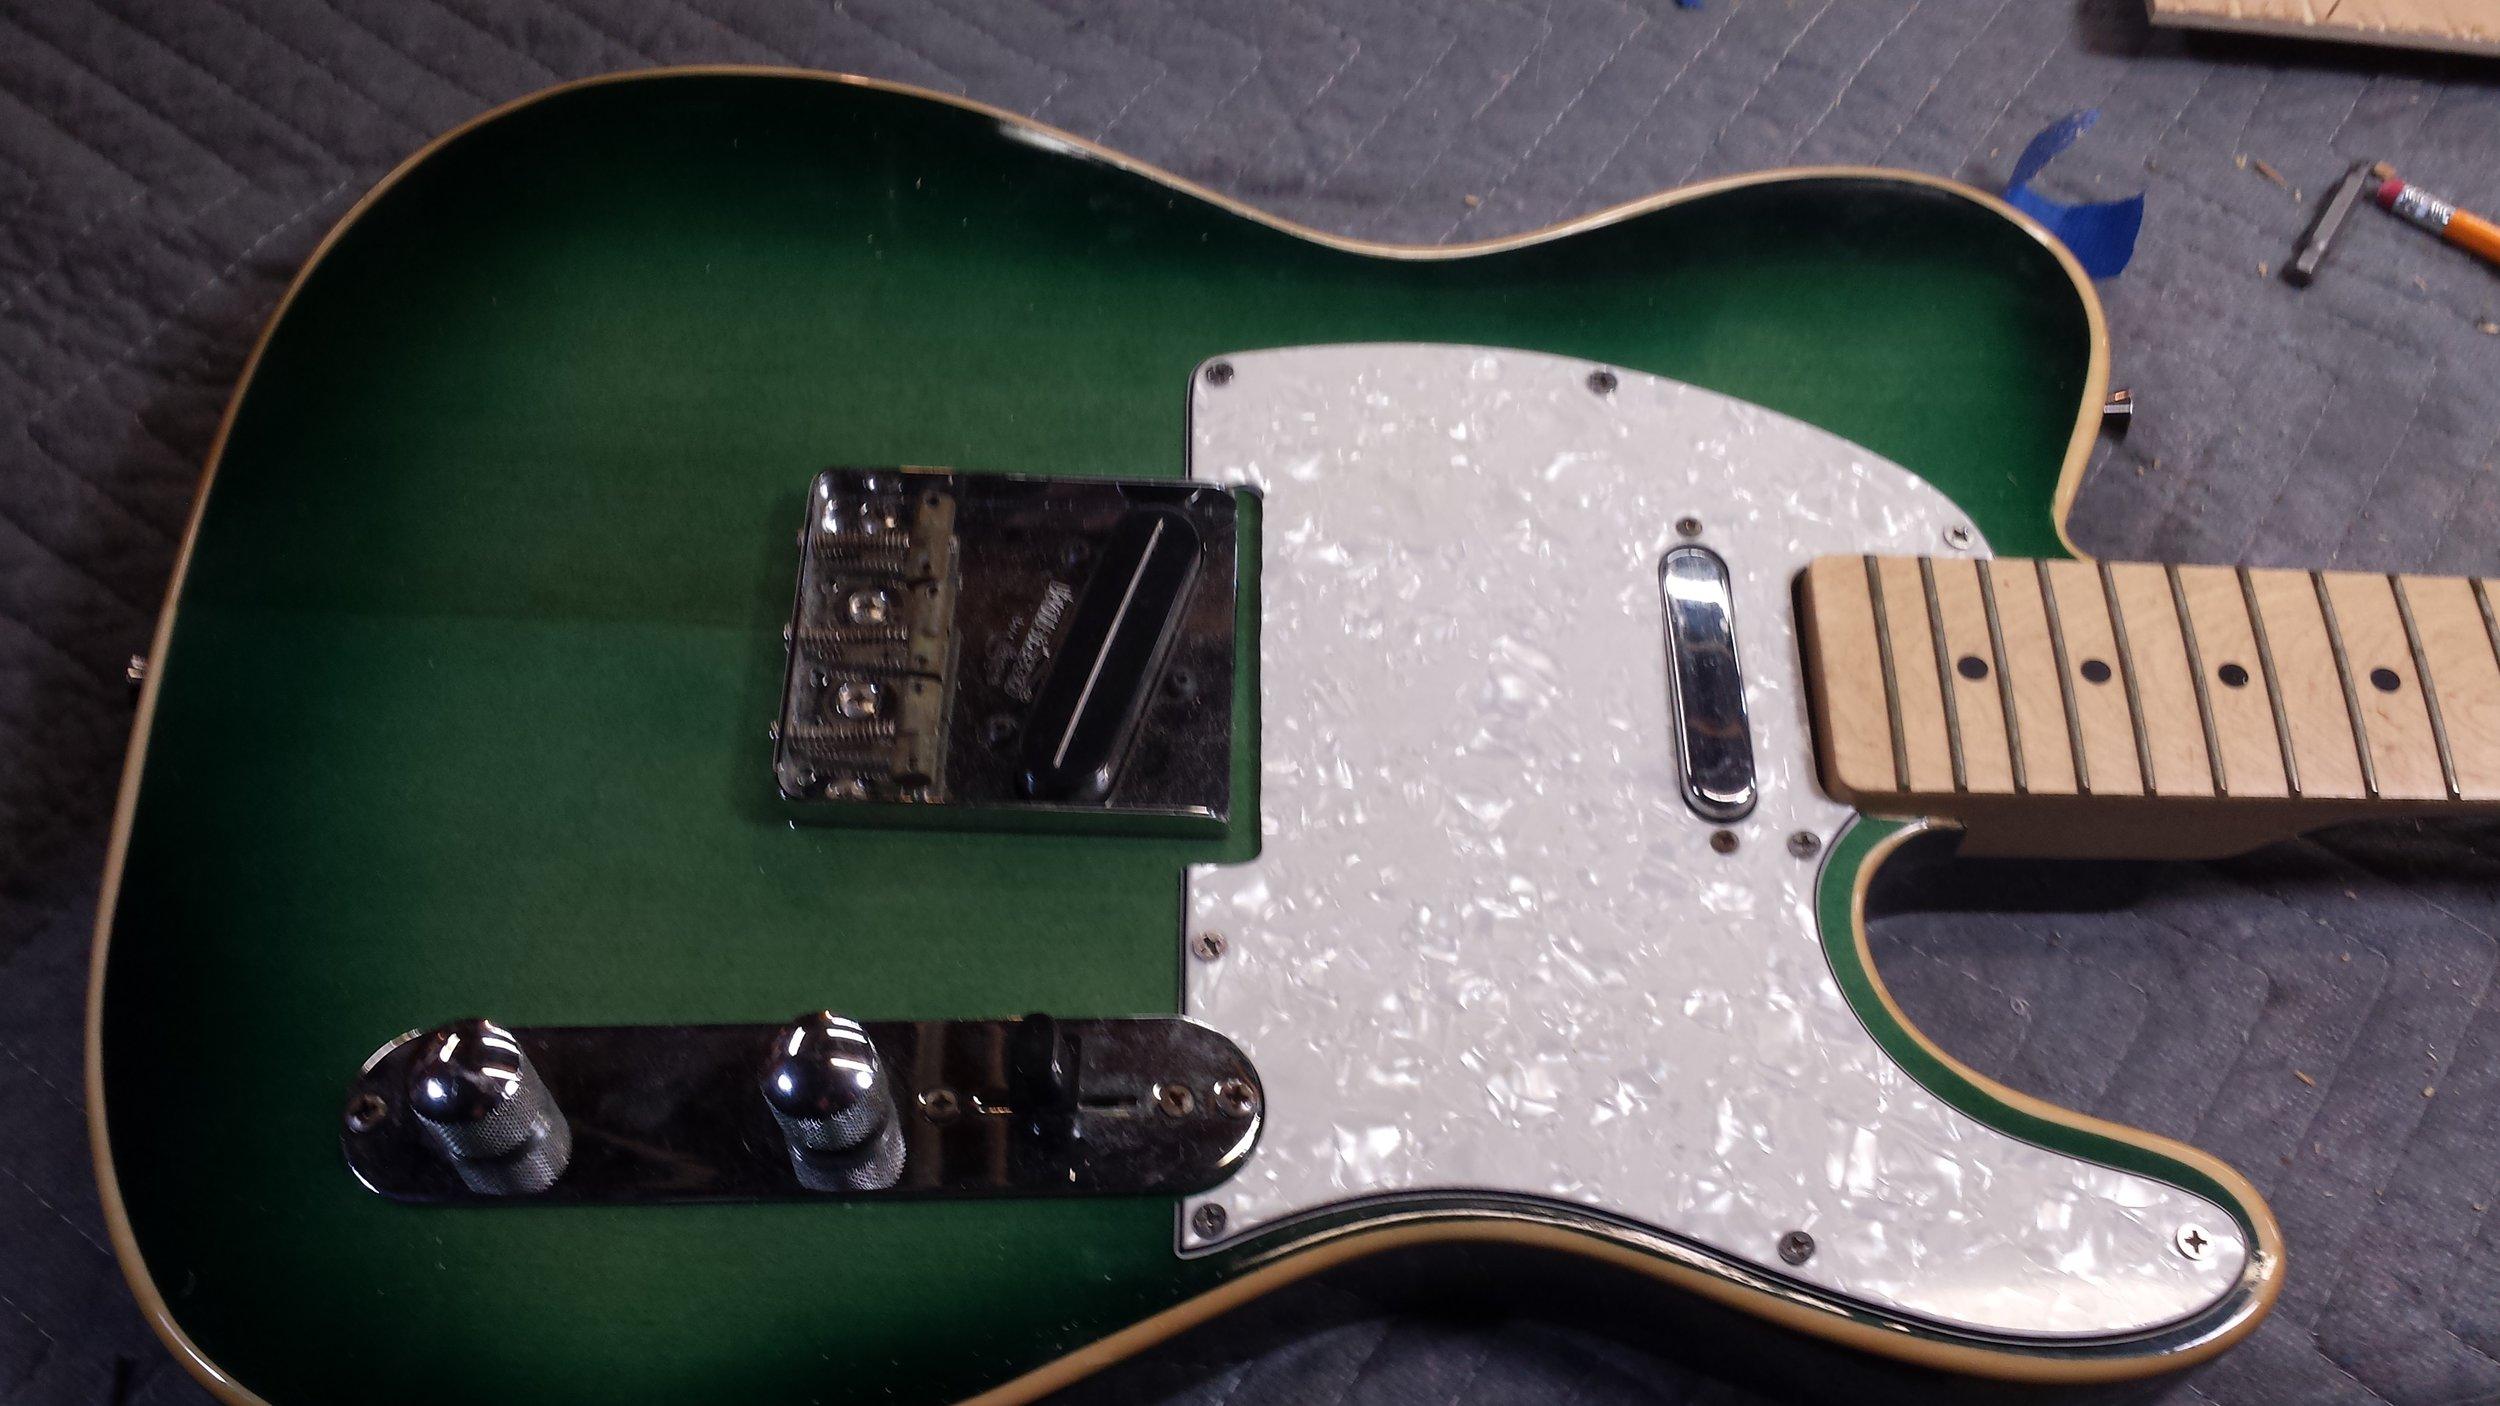 pawn-shop-guitar_32858145448_o.jpg